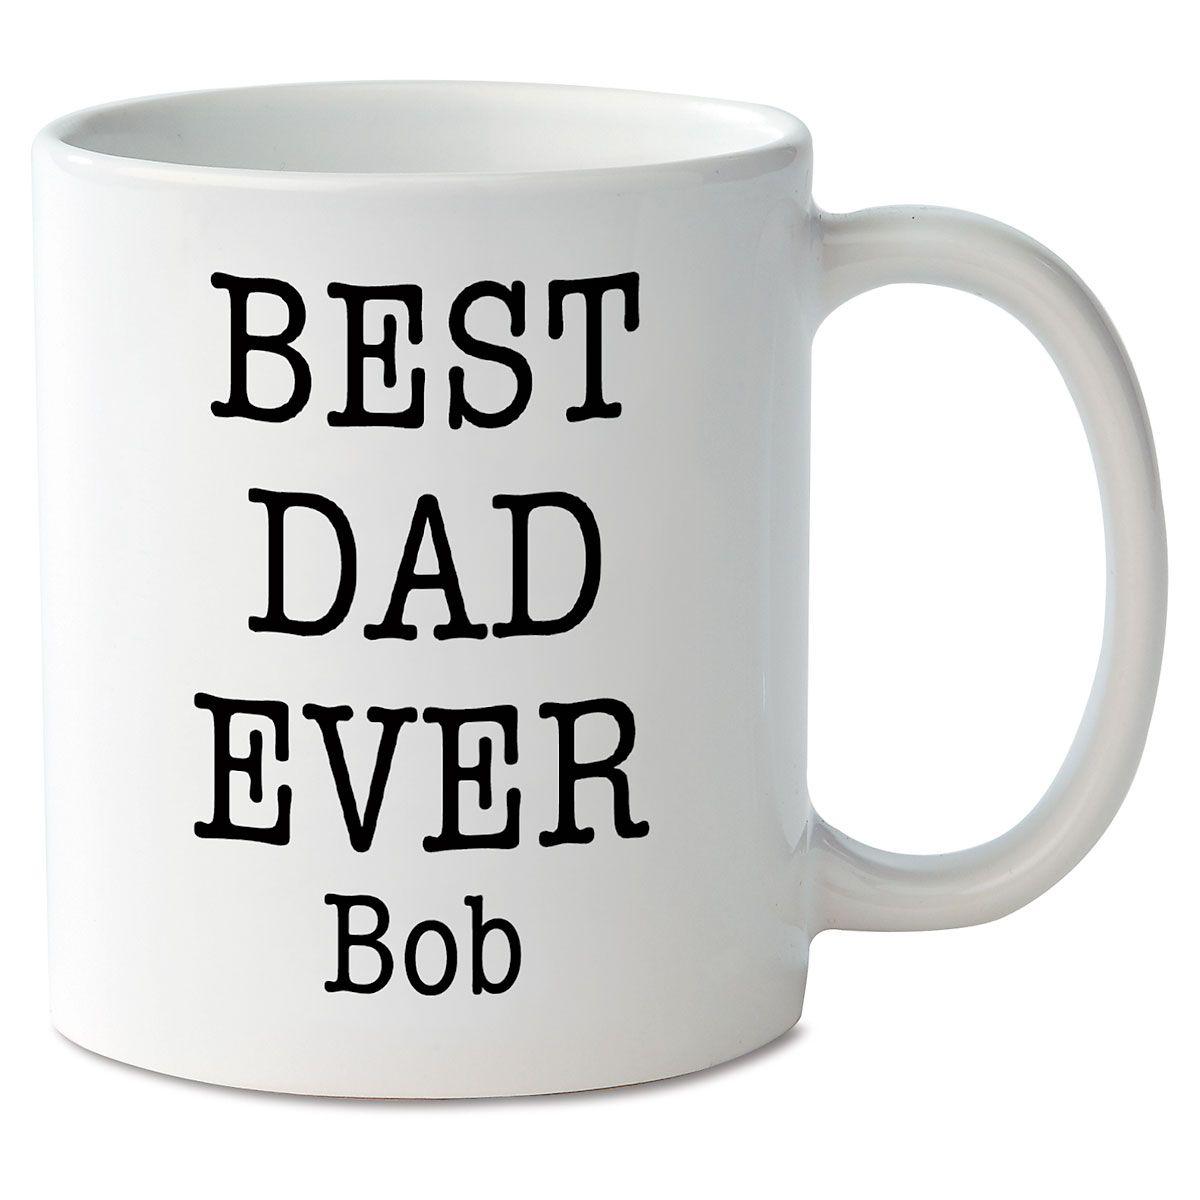 Best Dad Ever Personalized Mug